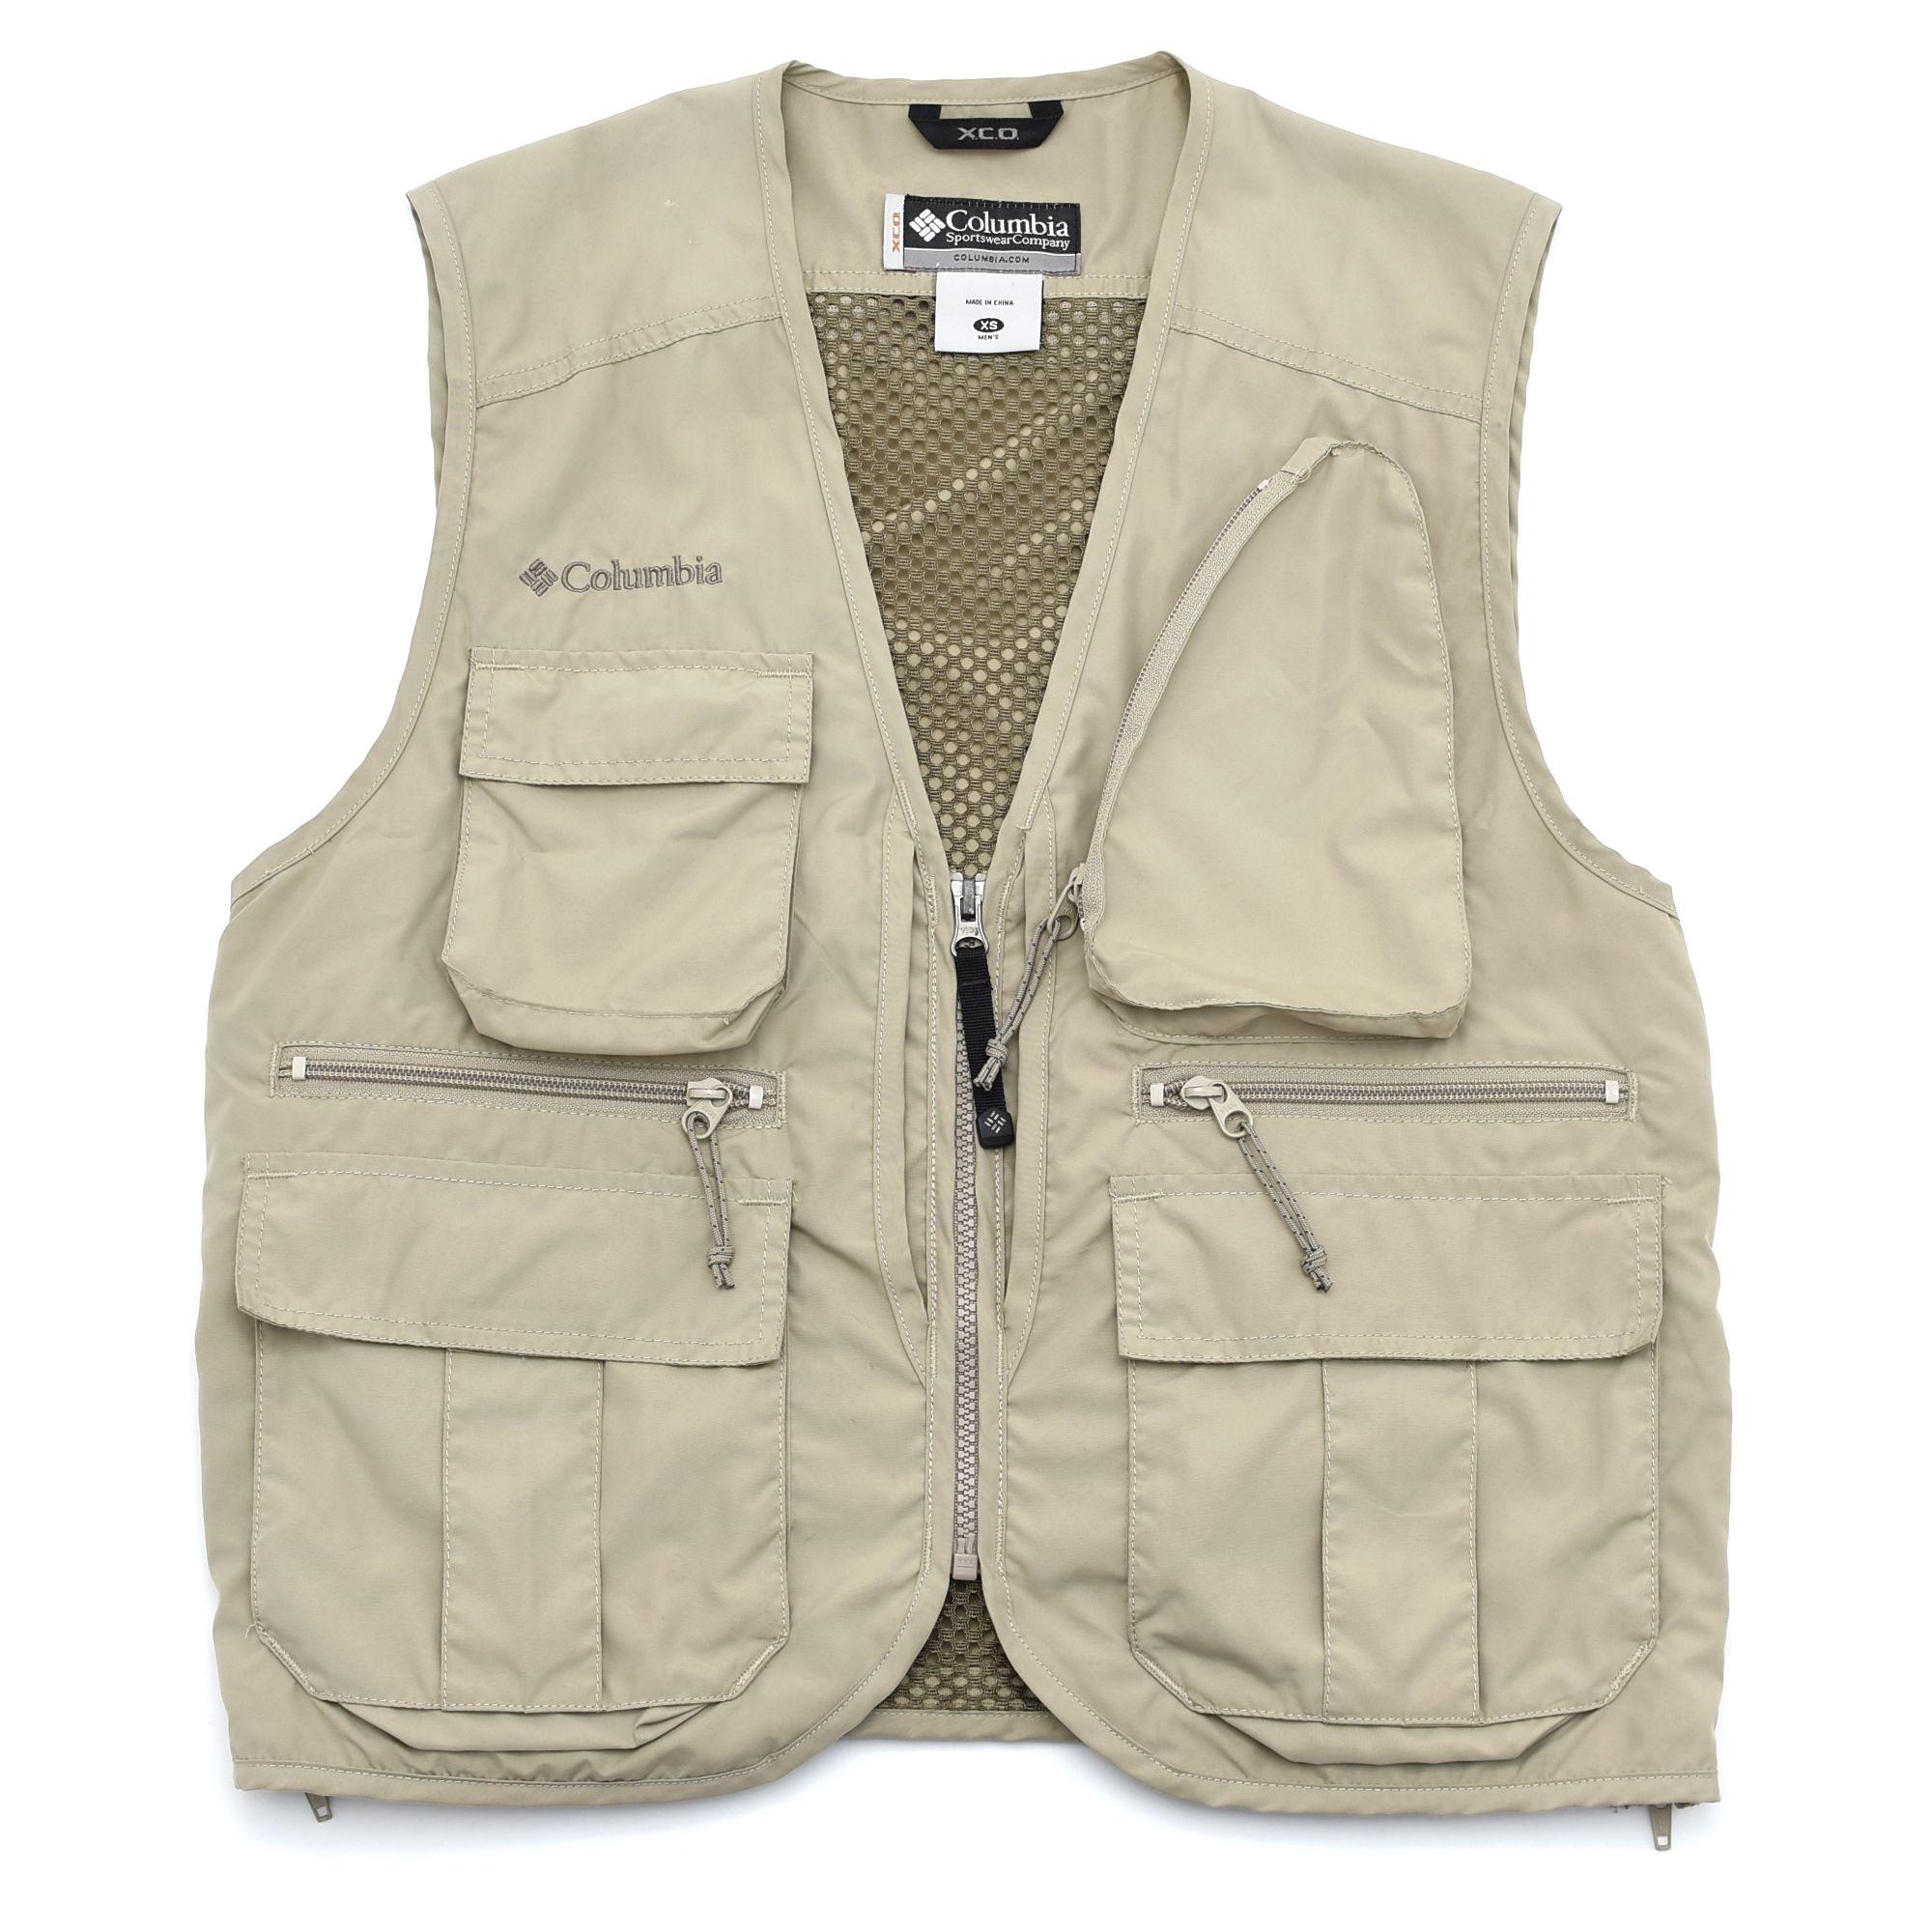 Columbia X.C.O fishing vest / utility vest